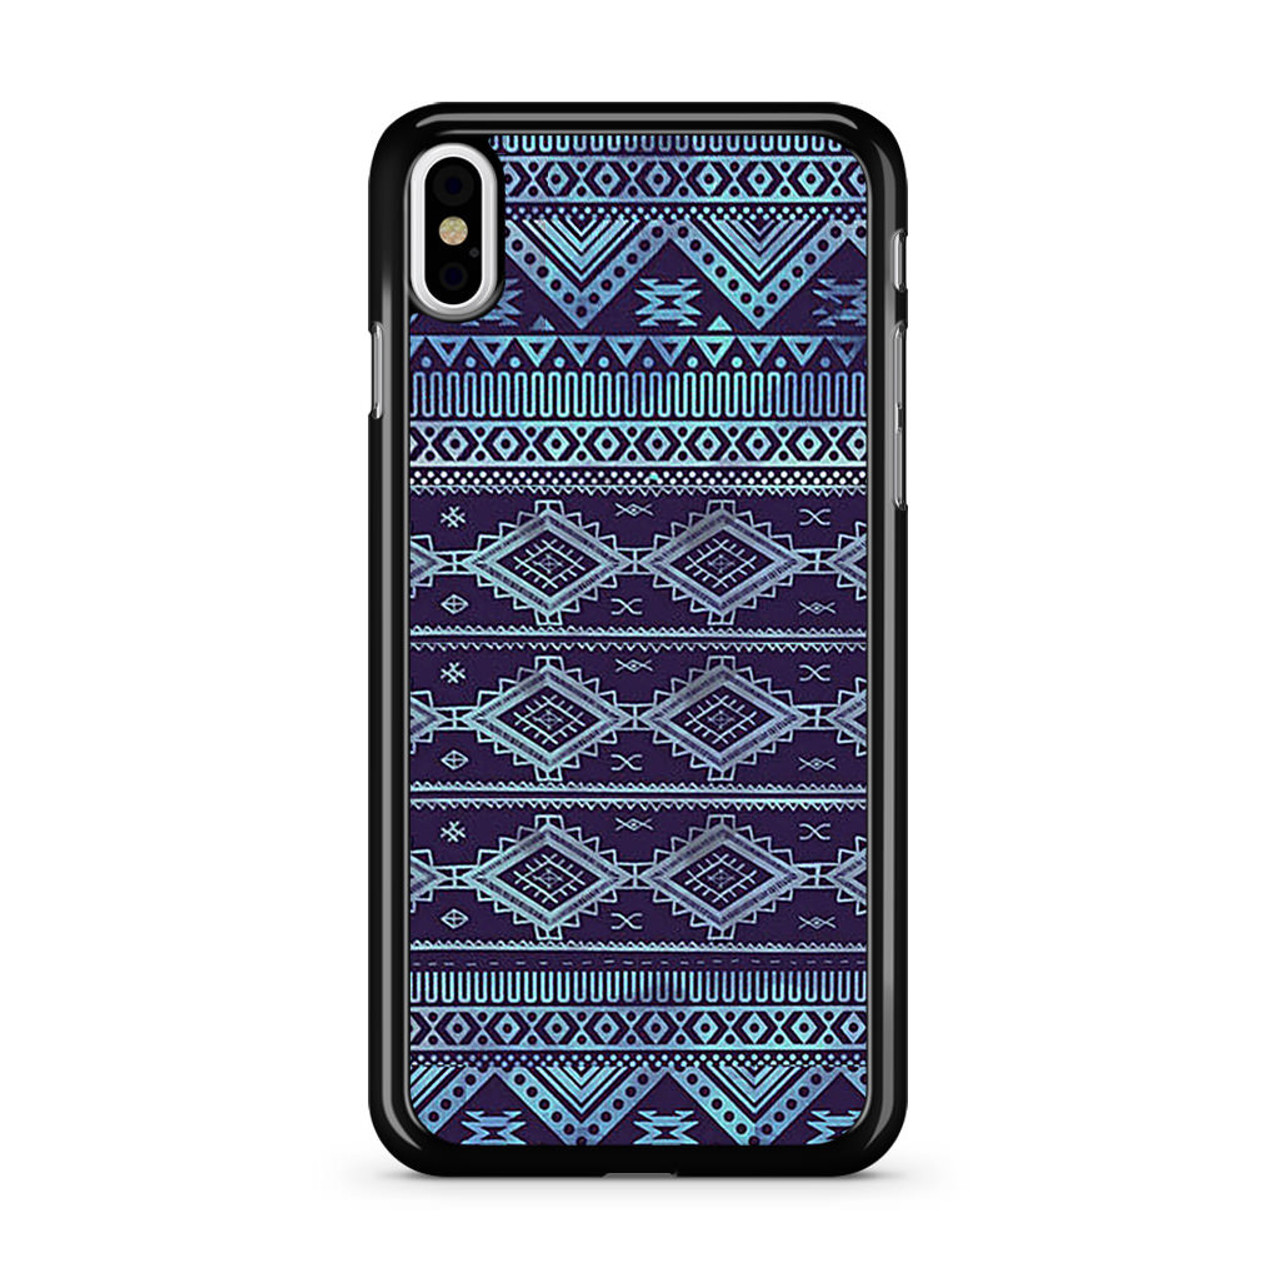 iphone xs case aztec